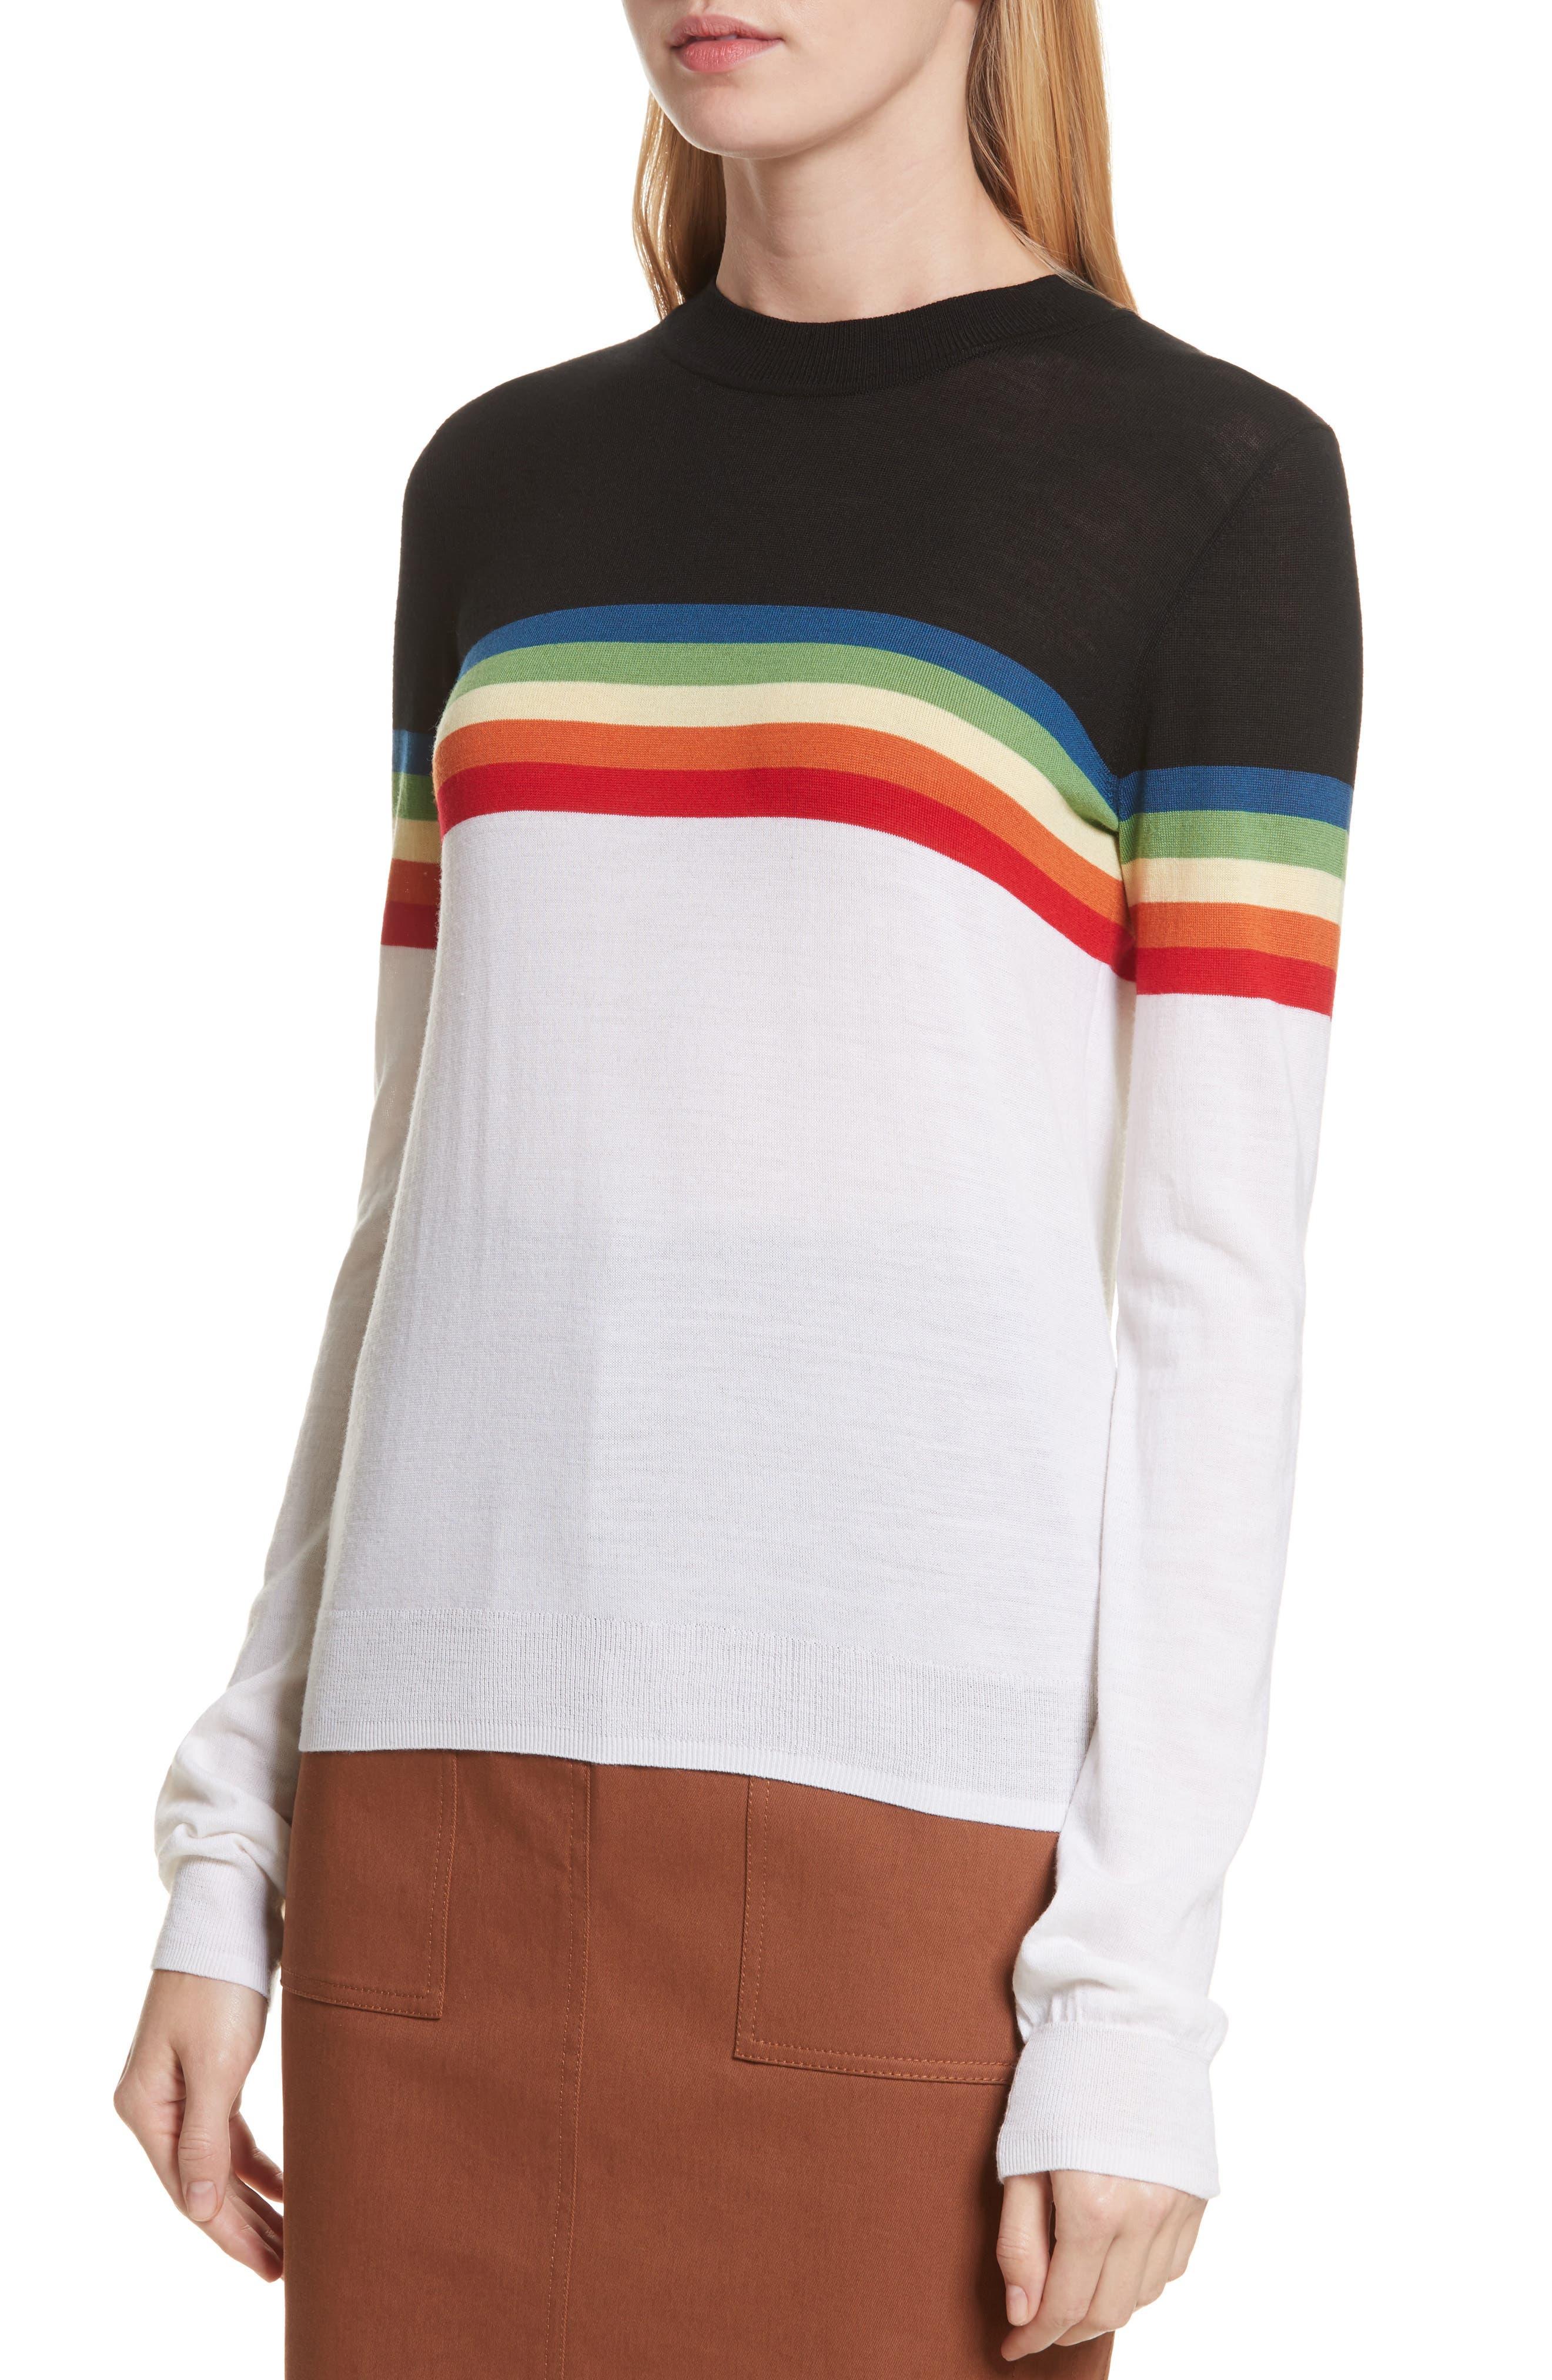 Diane von Furstenberg Rainbow Sweater,                             Alternate thumbnail 4, color,                             107